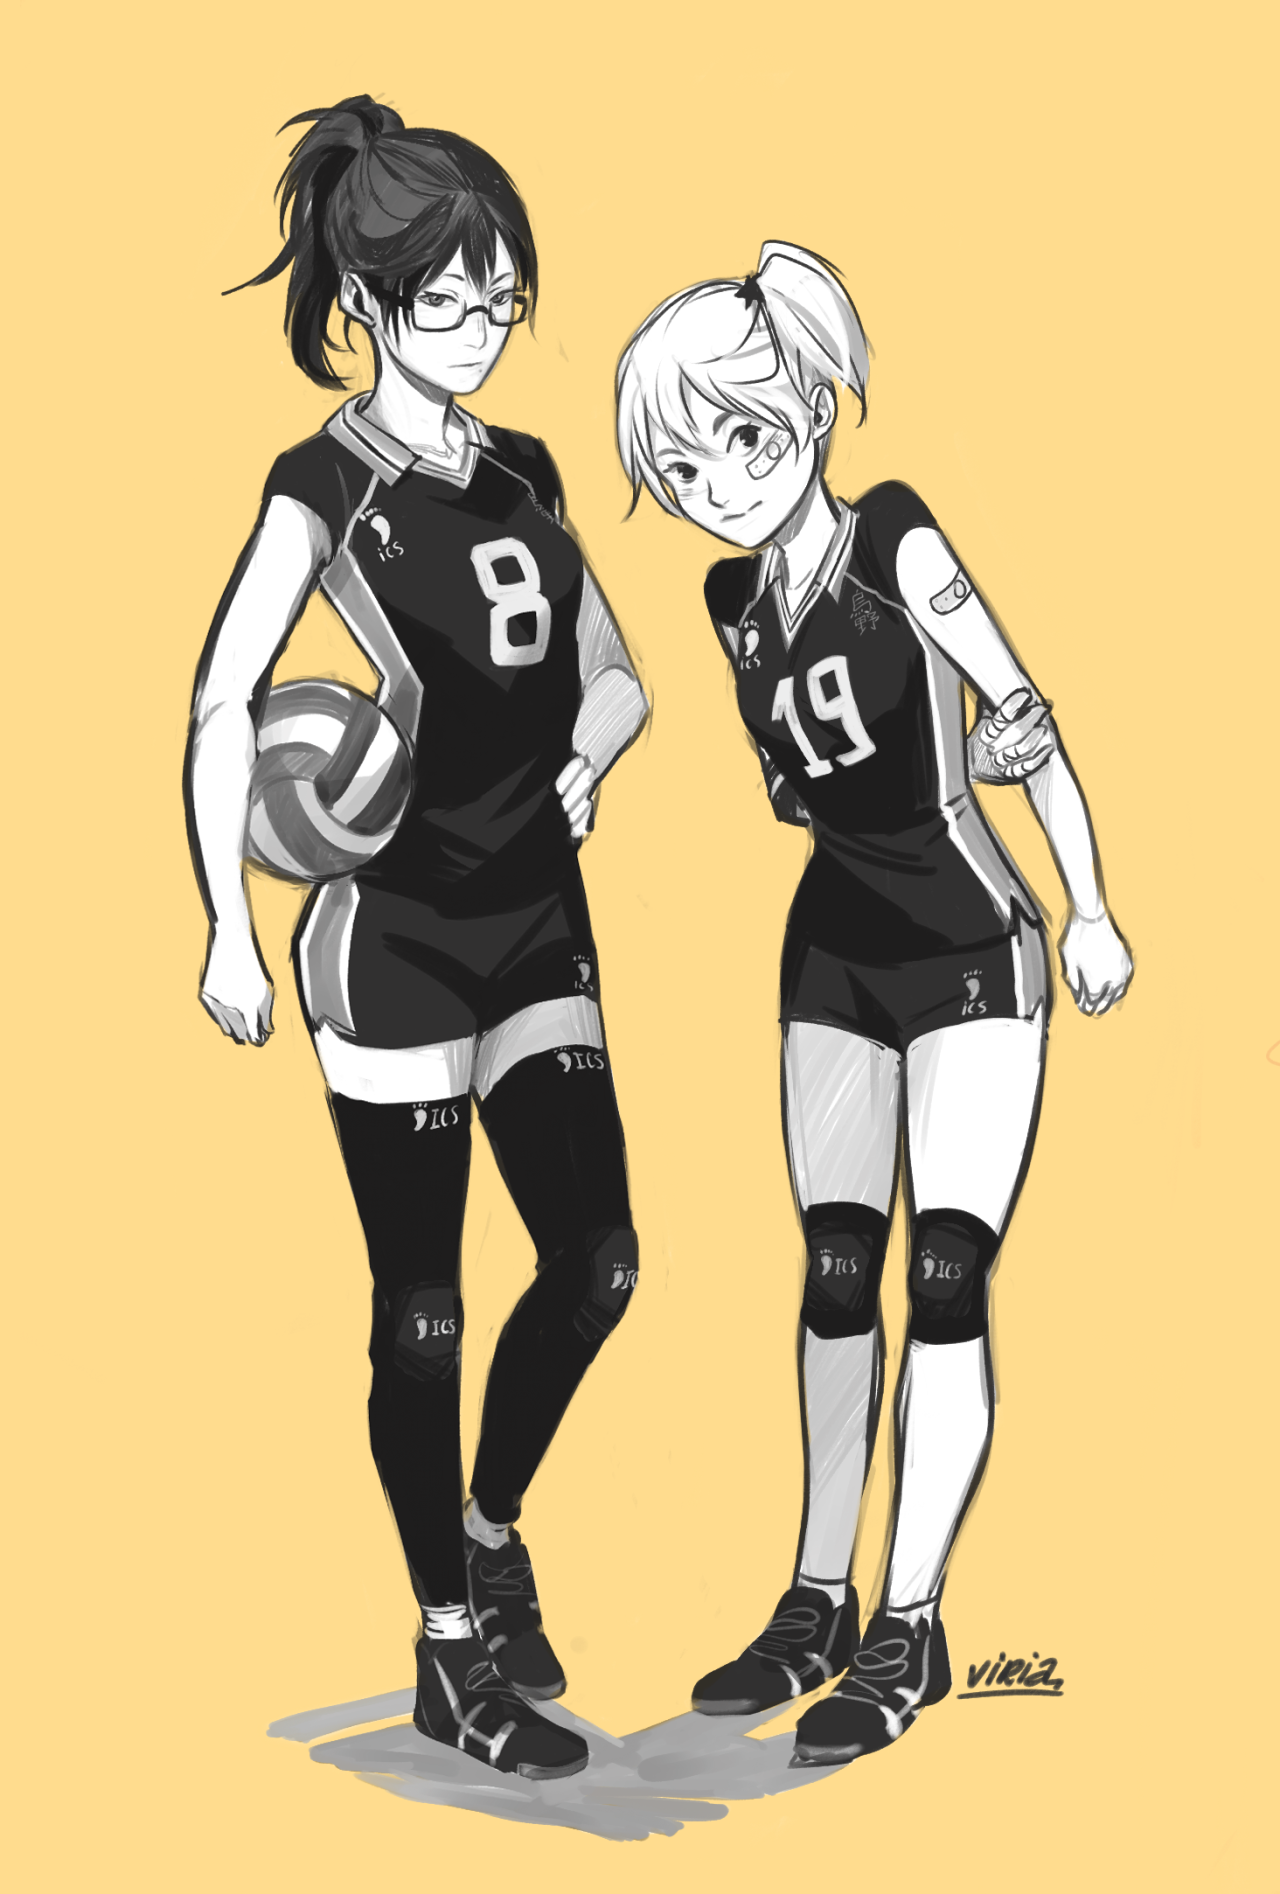 These Outfits Are My End Haikyuu Yachi Haikyuu Haikyuu Genderbend